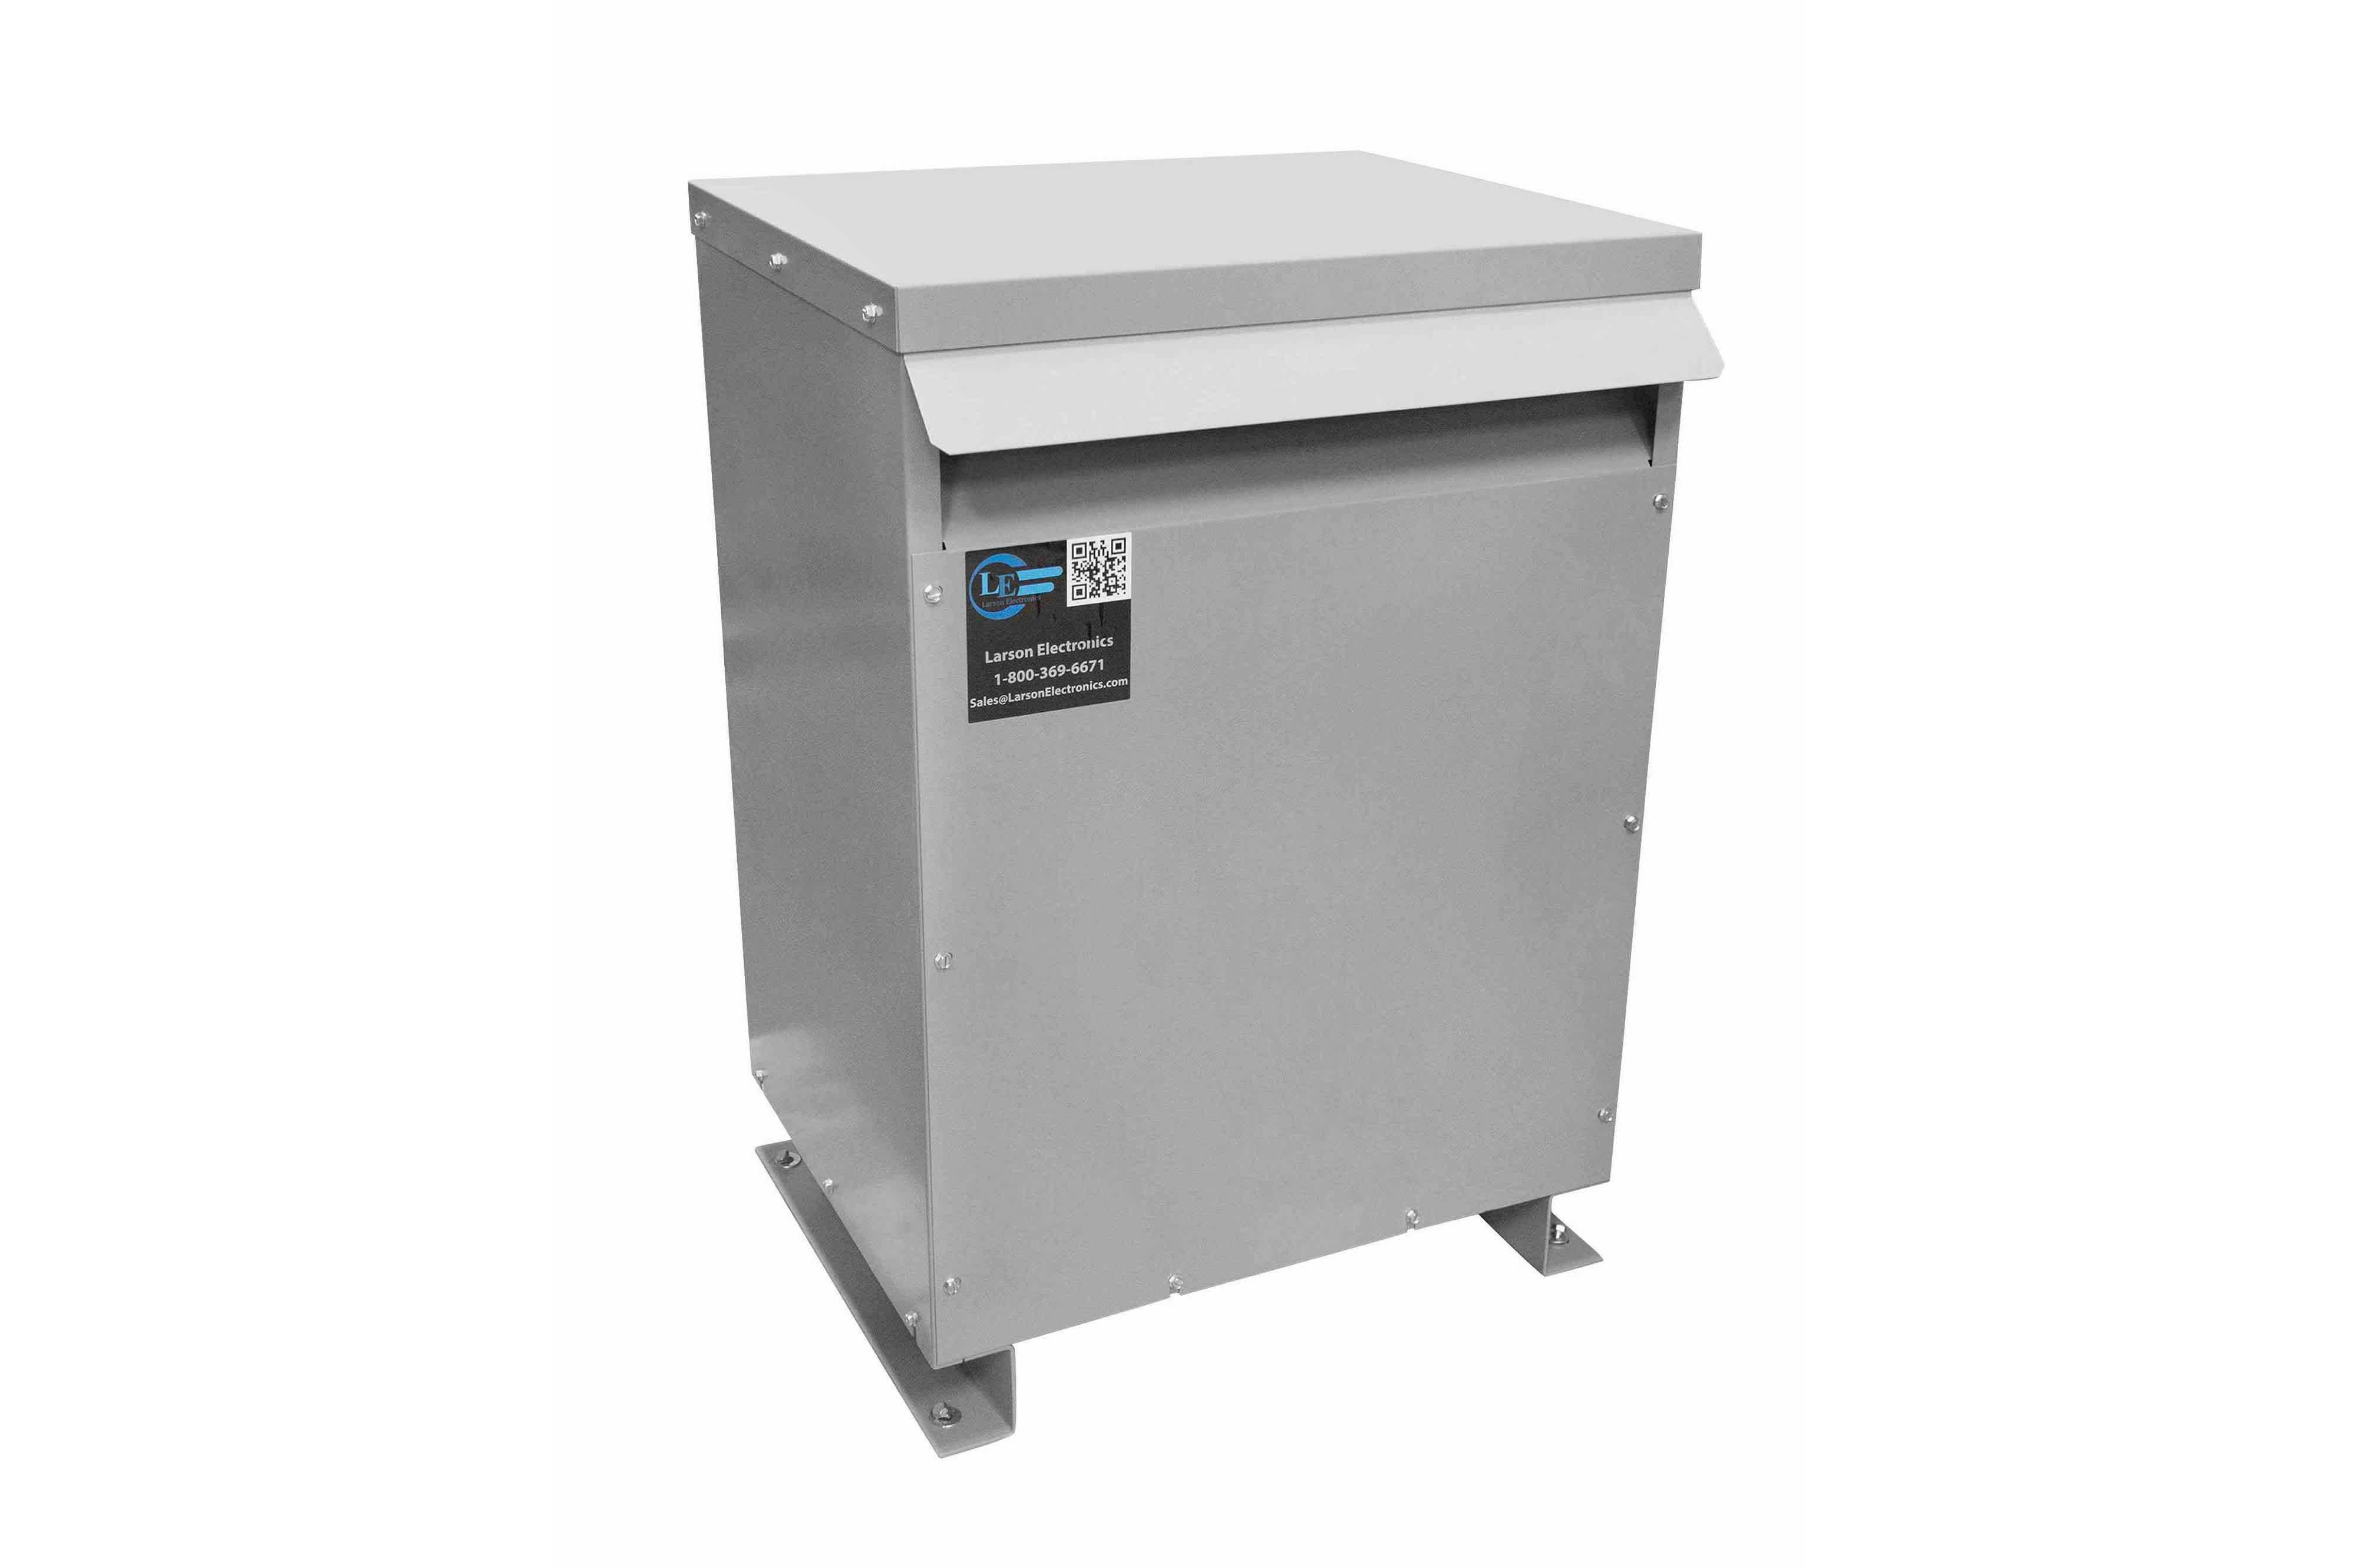 52.5 kVA 3PH Isolation Transformer, 600V Wye Primary, 208Y/120 Wye-N Secondary, N3R, Ventilated, 60 Hz